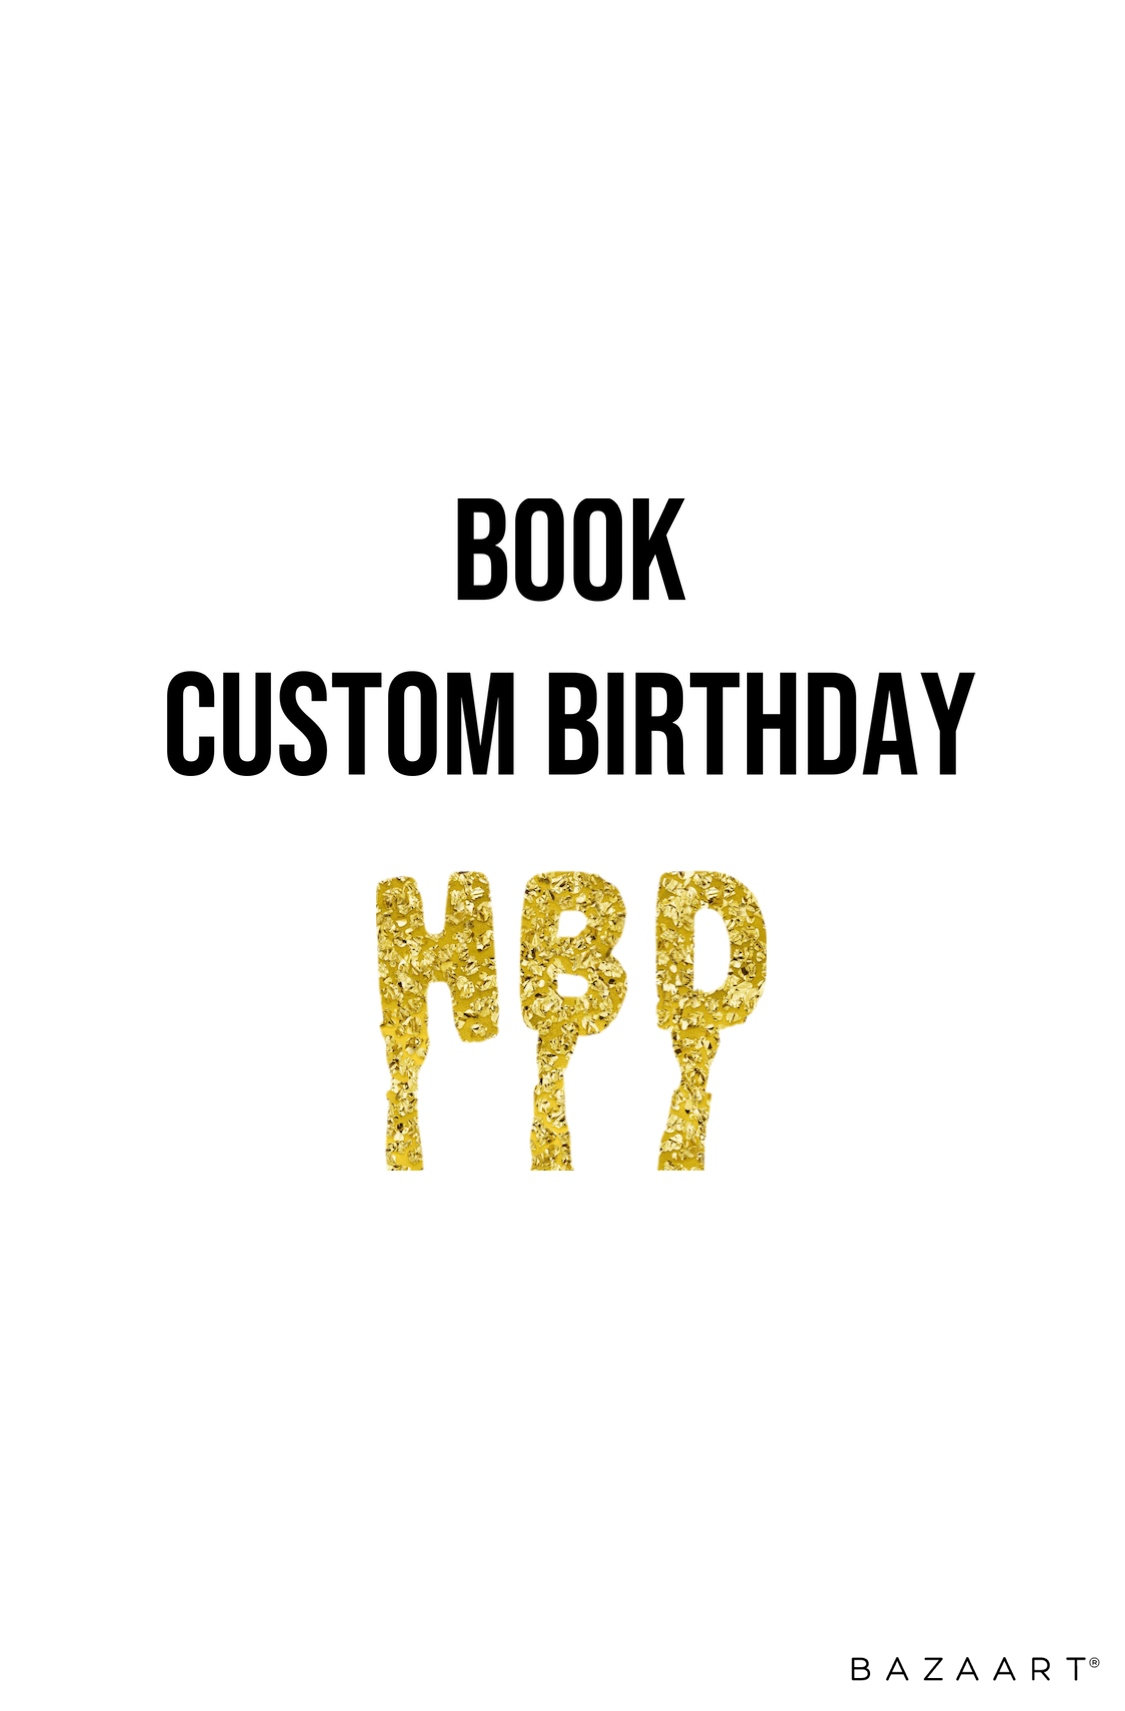 Custom Birthday Outfit Consultation